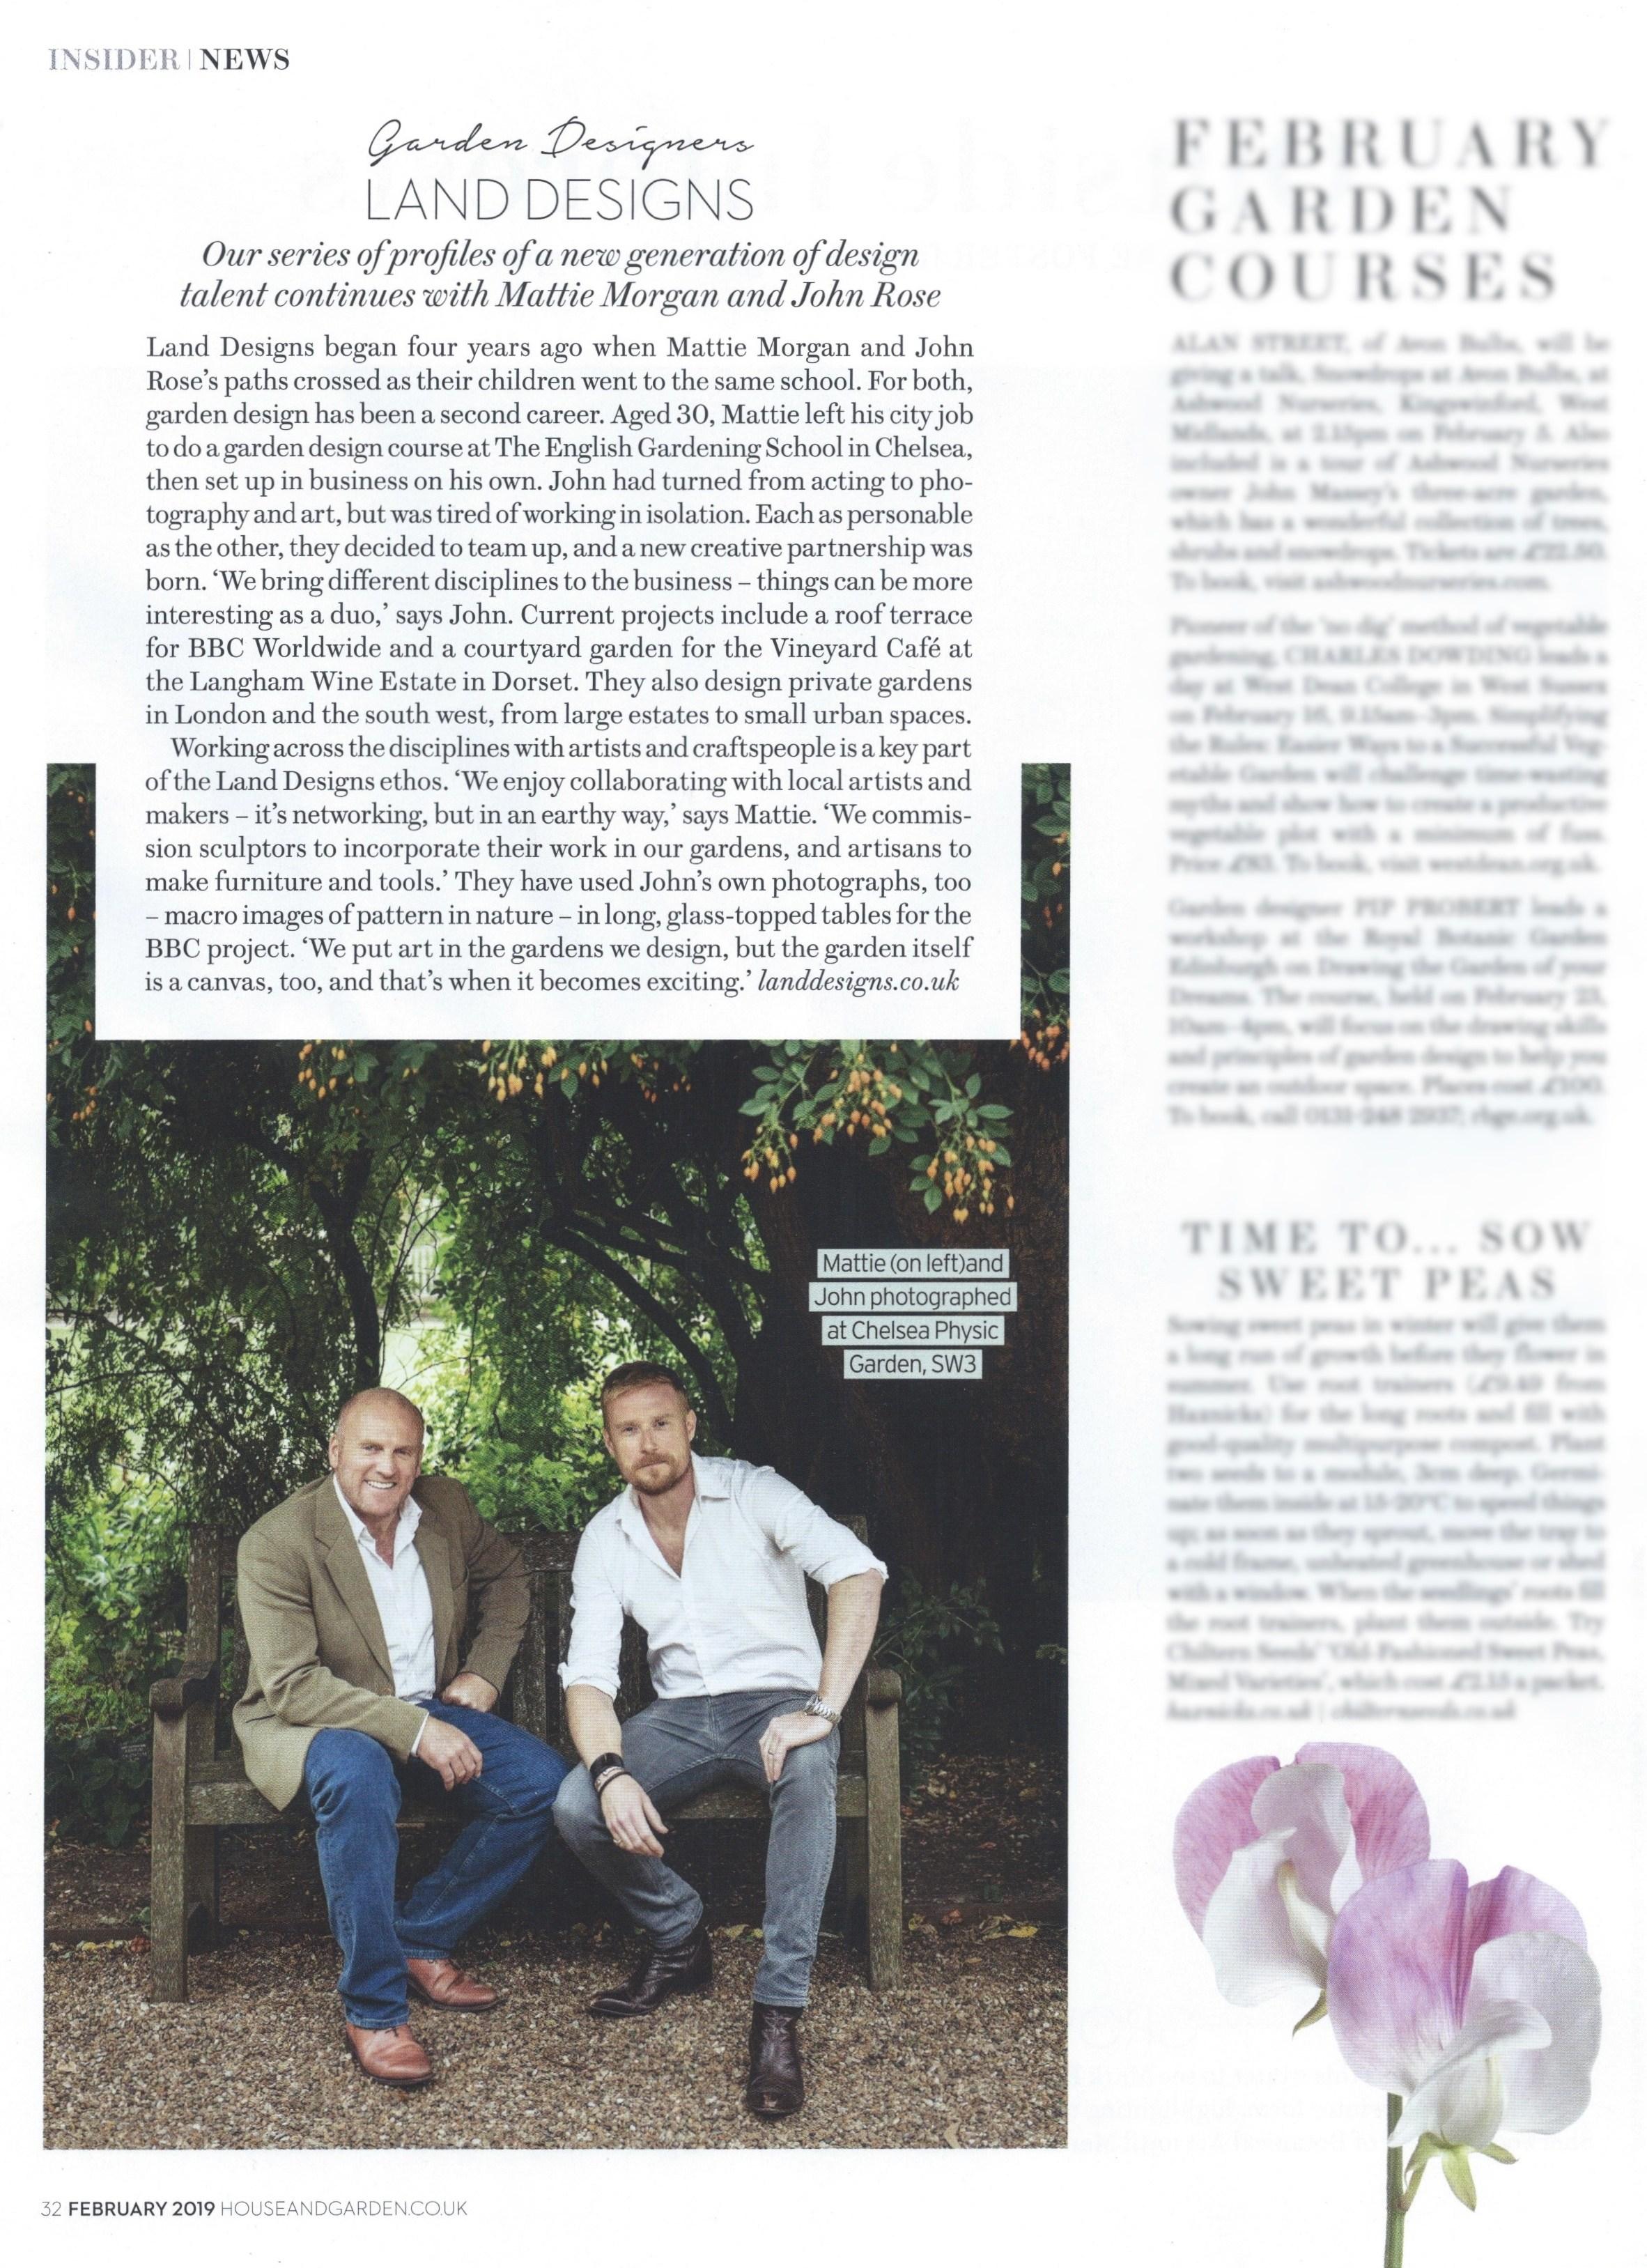 Mattie Morgan & John Rose House & Garden article February 2019